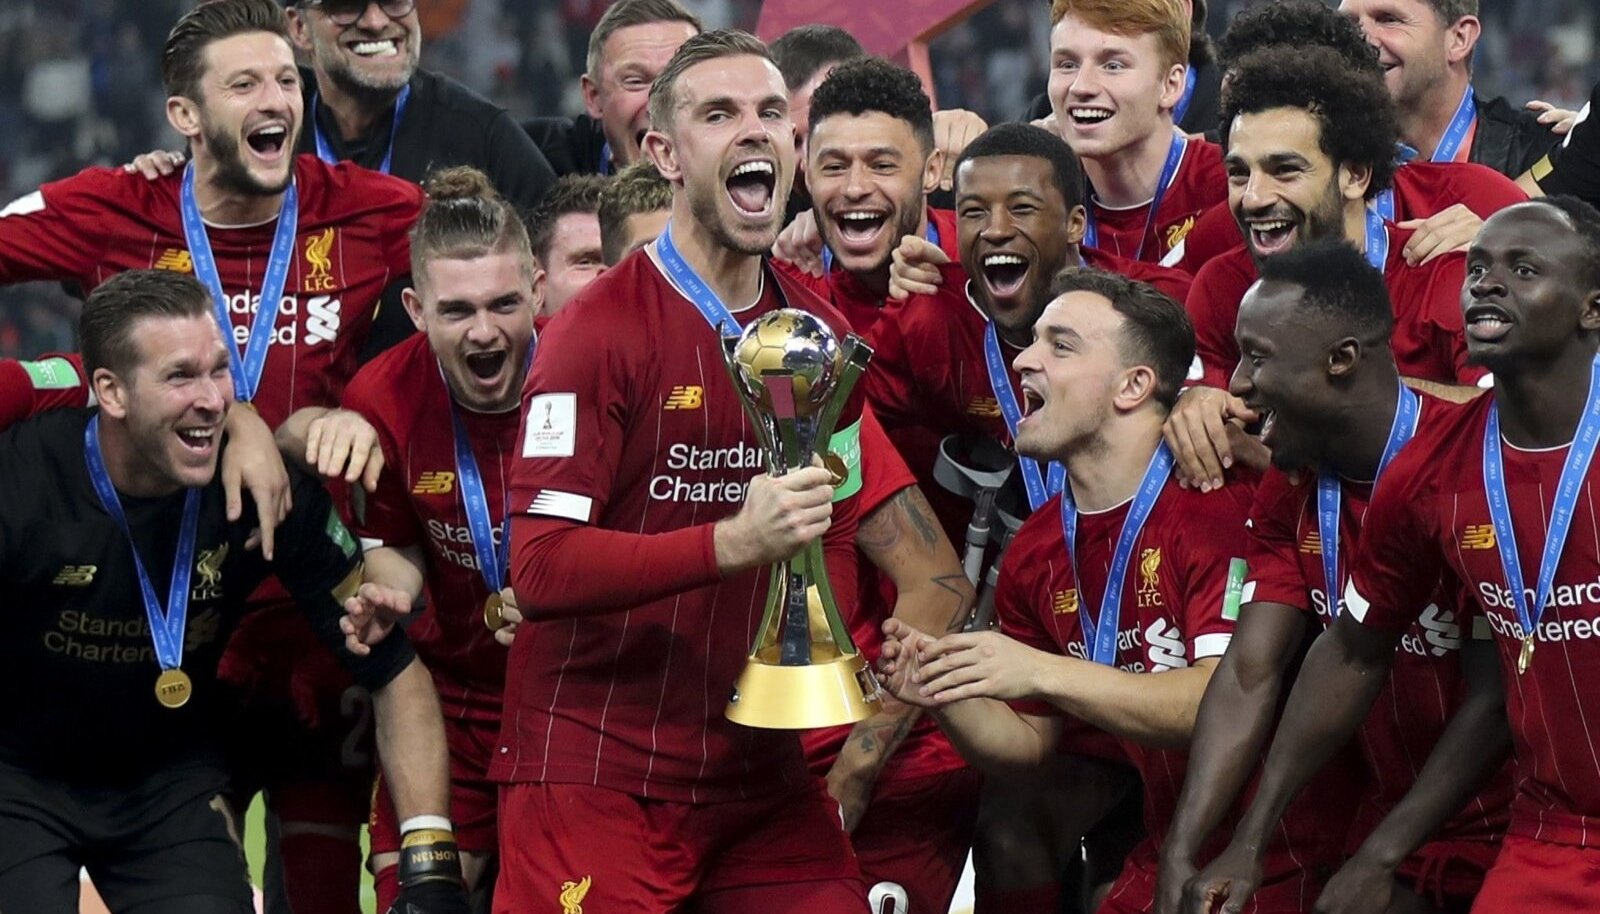 (SP)QATAR-DOHA-FOOTBALL-FIFA CLUB WORLD CUP-FINAL